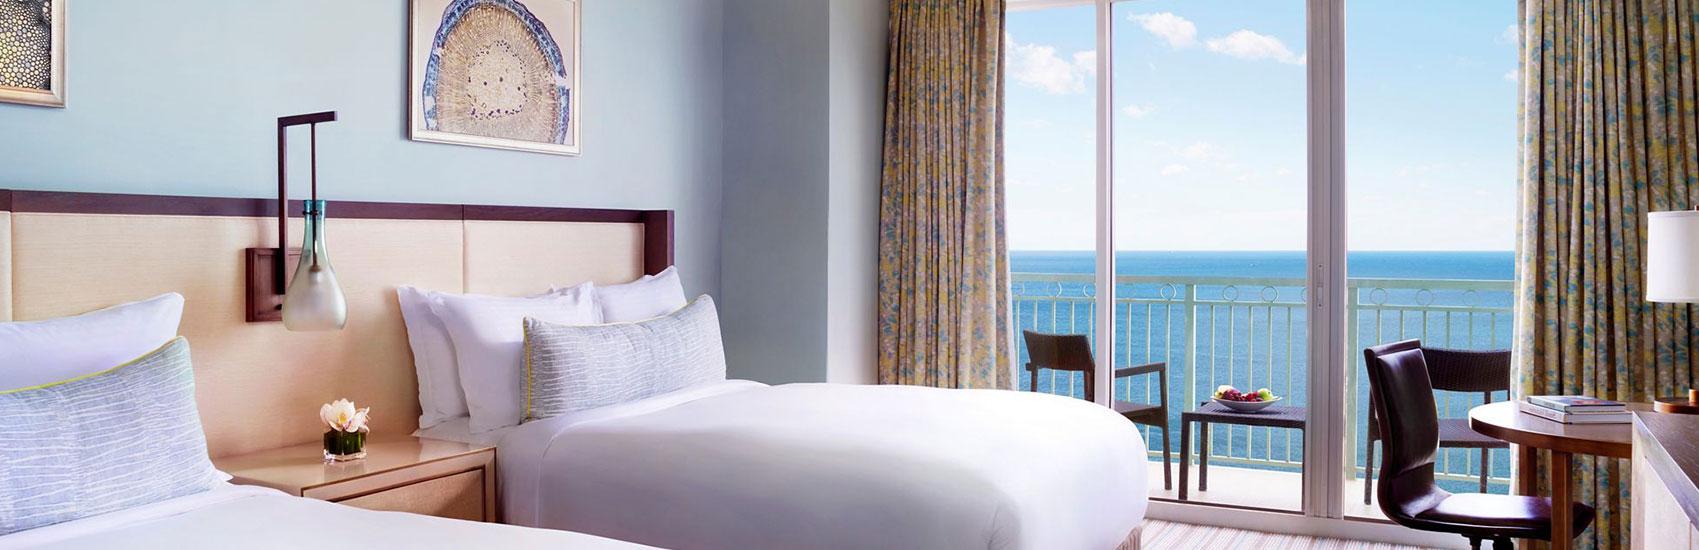 The Ritz Carlton, Key Biscayne 1